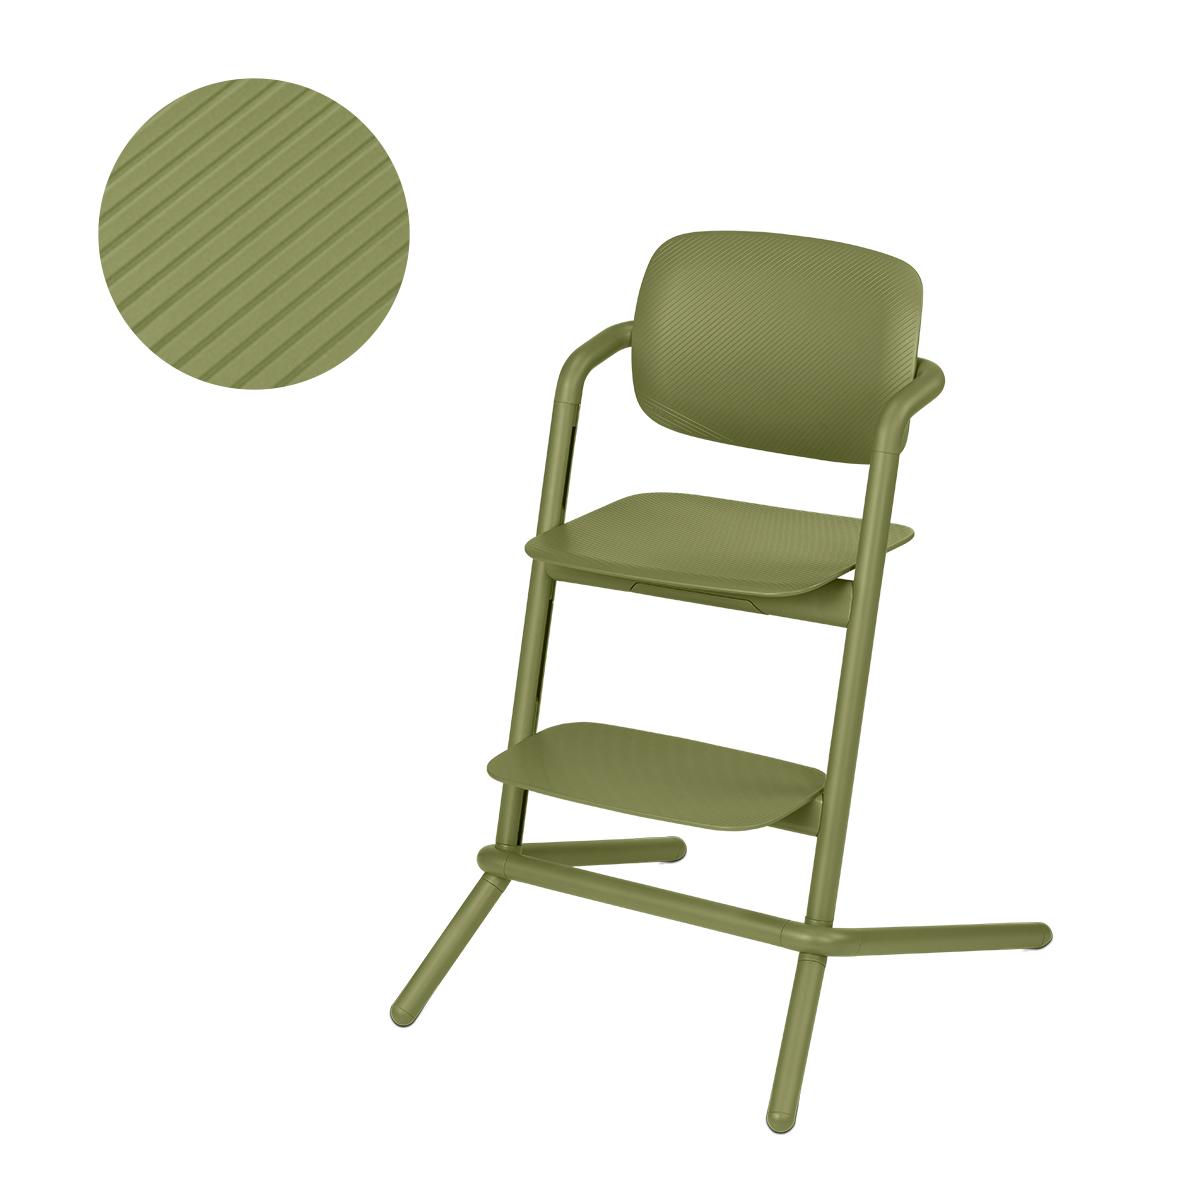 lemo_cybex_green_chaise_haute_1